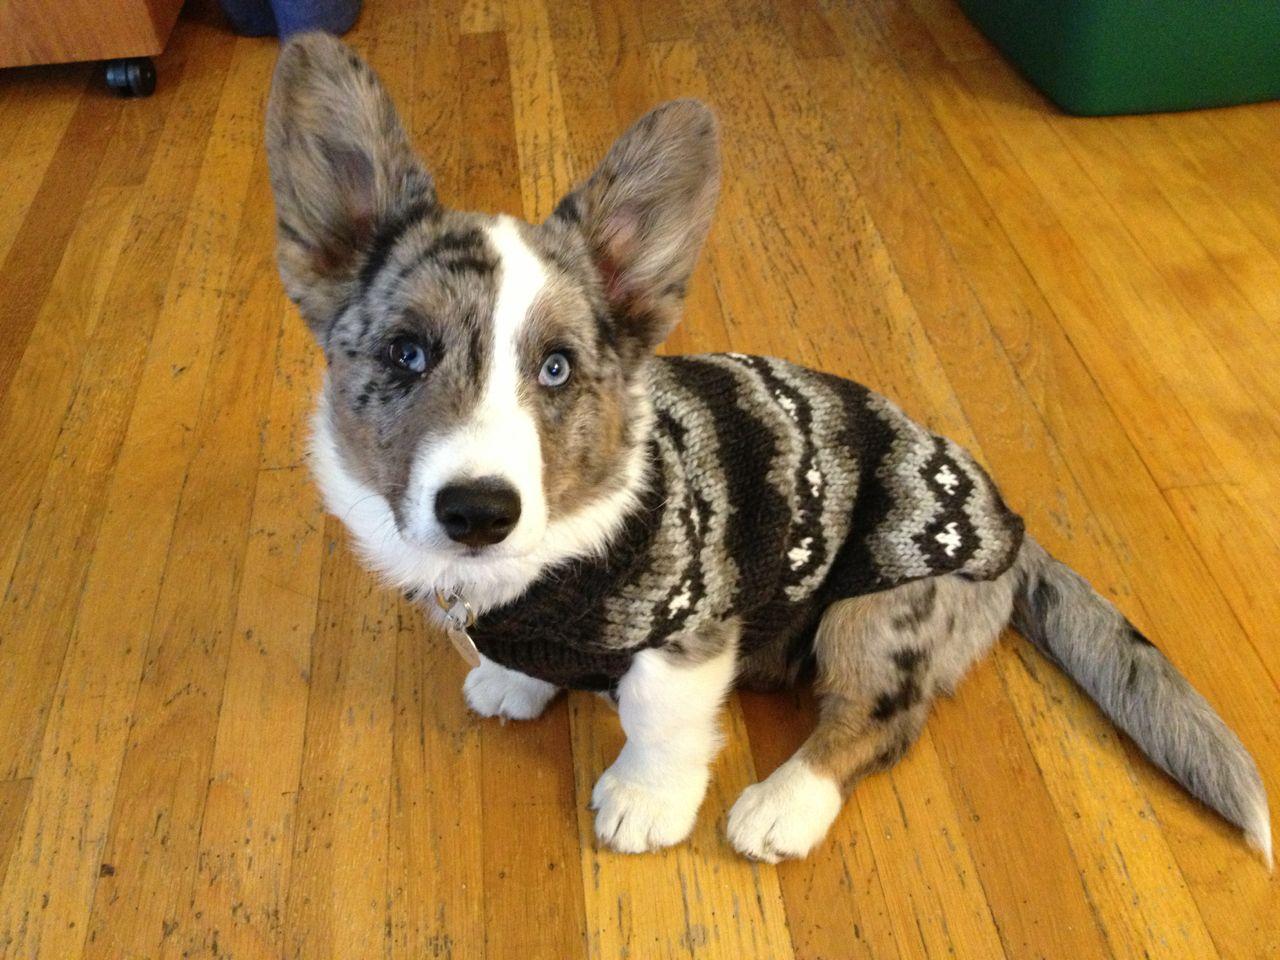 Best Blue Merle Corgi Images On Pinterest Adorable Animals - 22 adorable animals wearing miniature sweaters